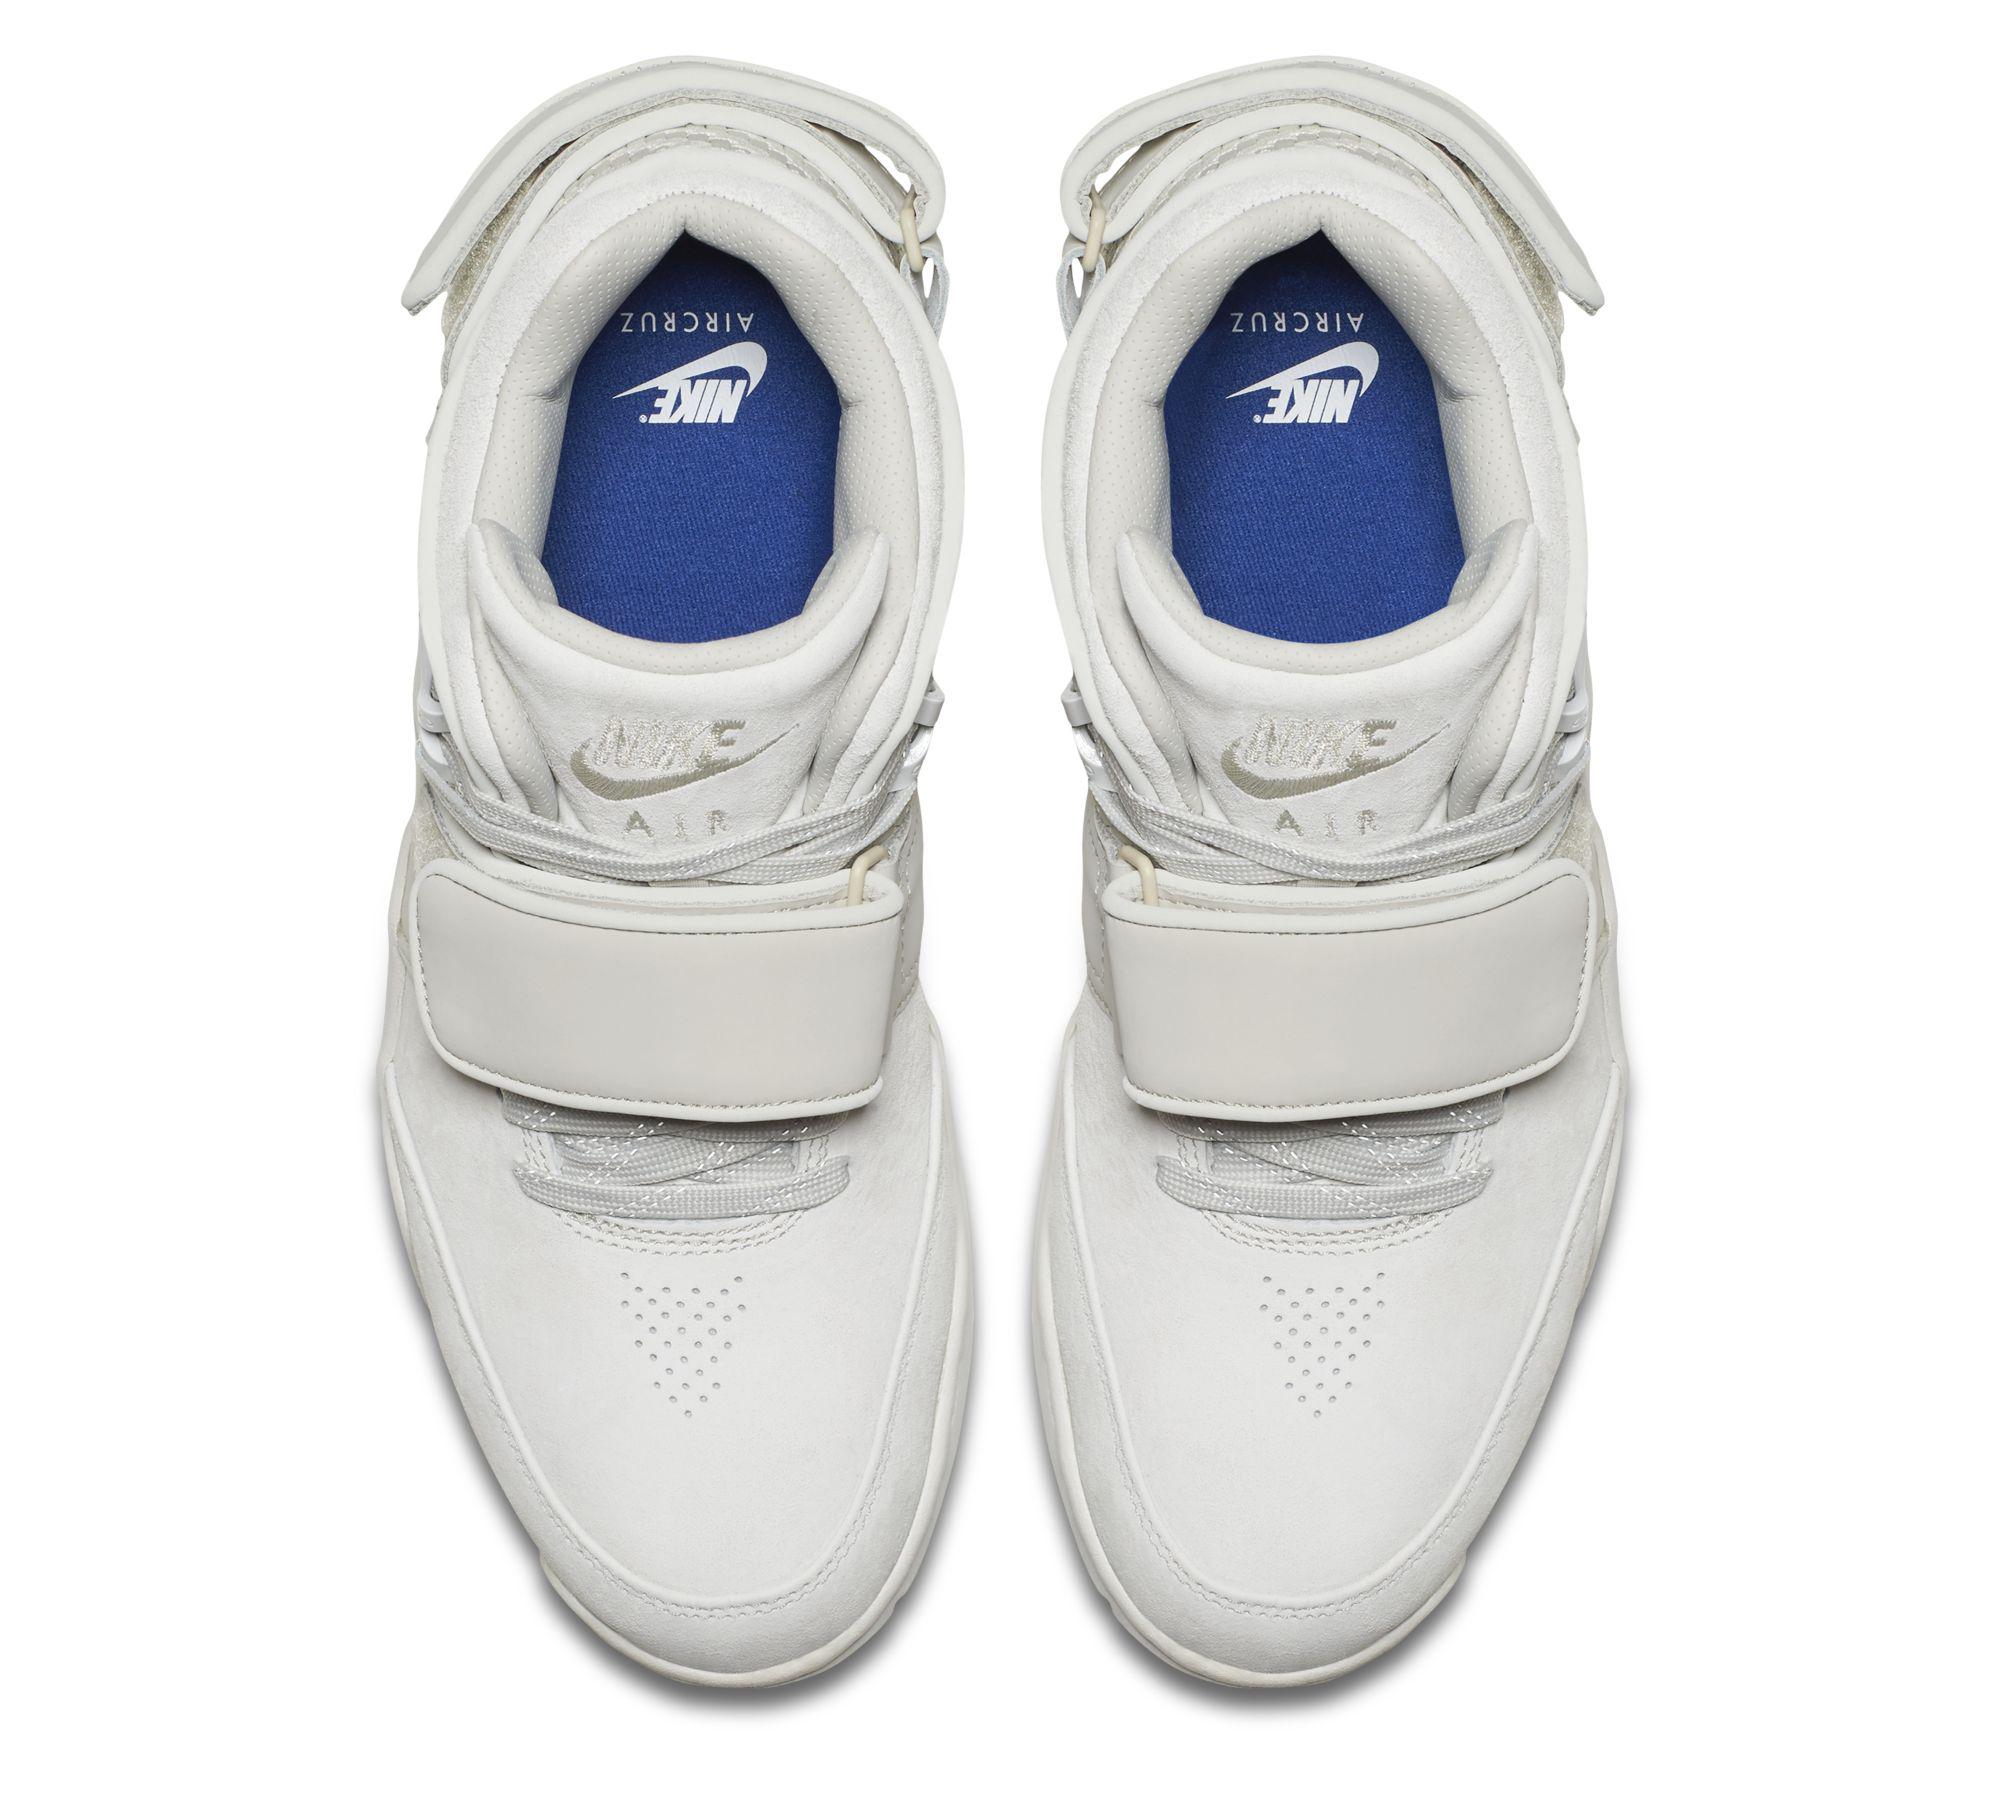 new concept 7061c 12f8f Nike Air Trainer Cruz Cream Blue Top